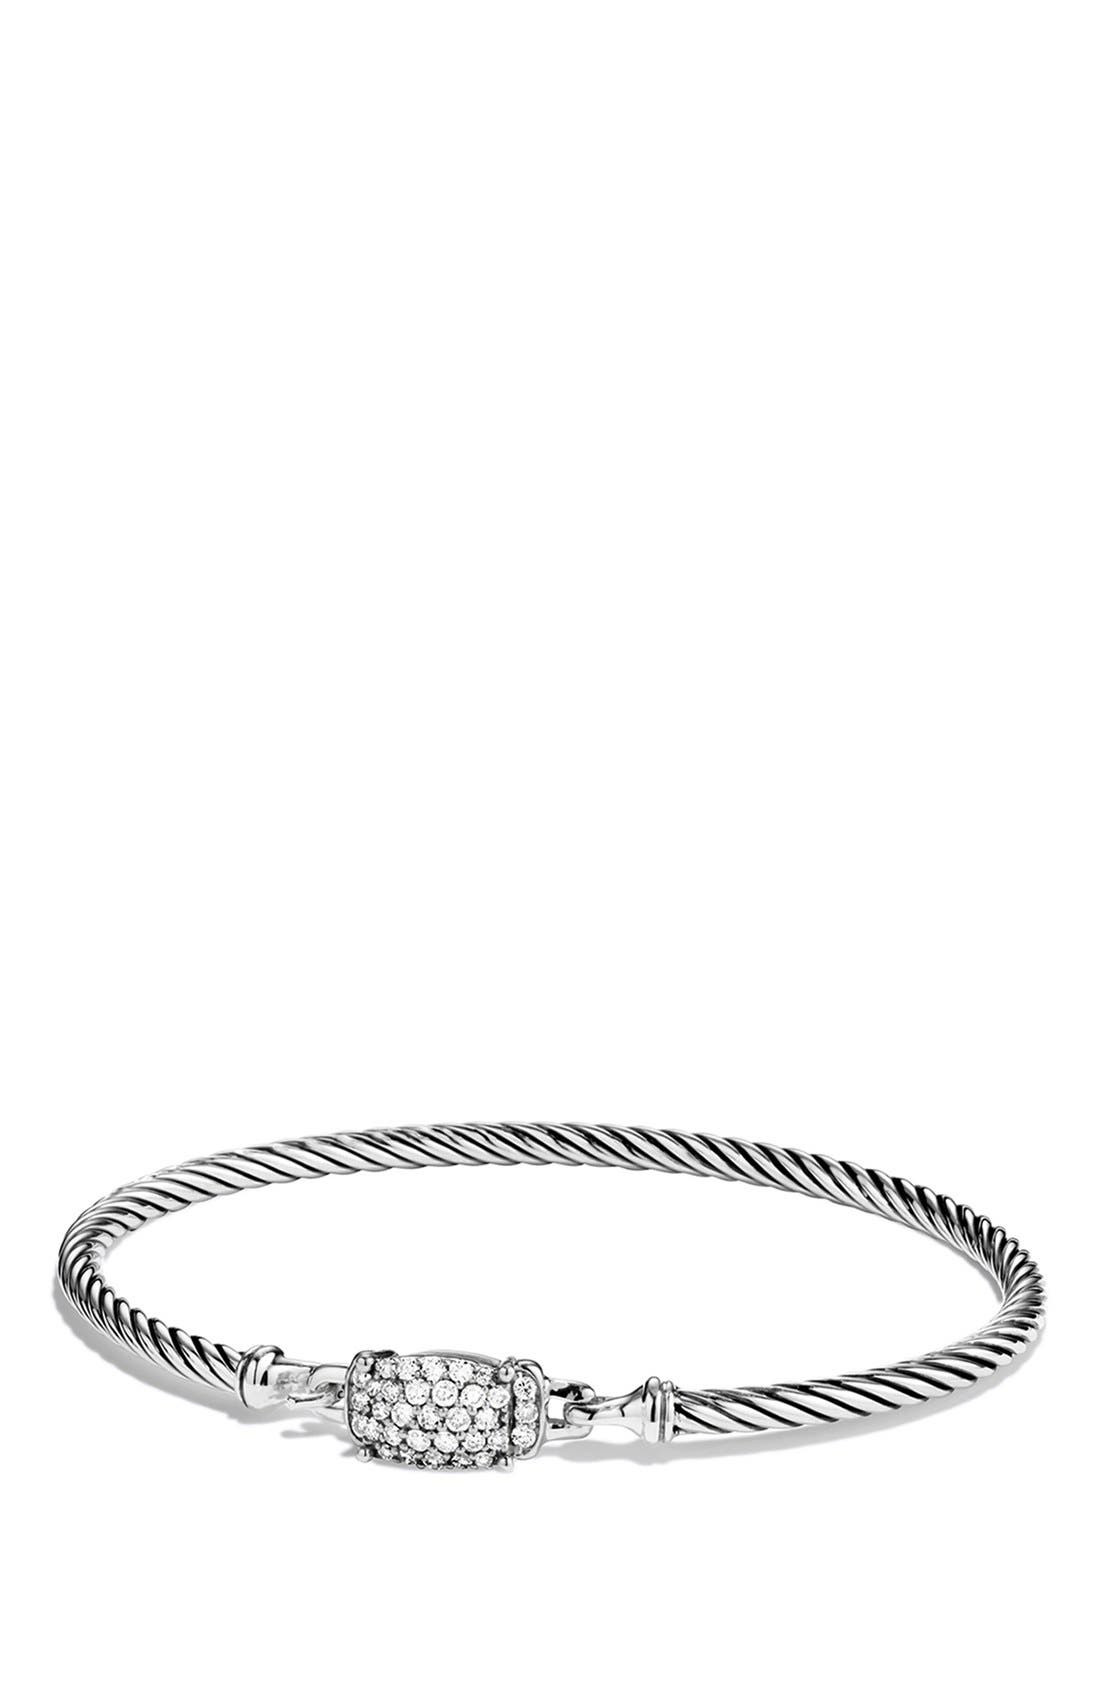 'Petite Wheaton' Bracelet with Diamonds,                             Main thumbnail 1, color,                             DIAMOND